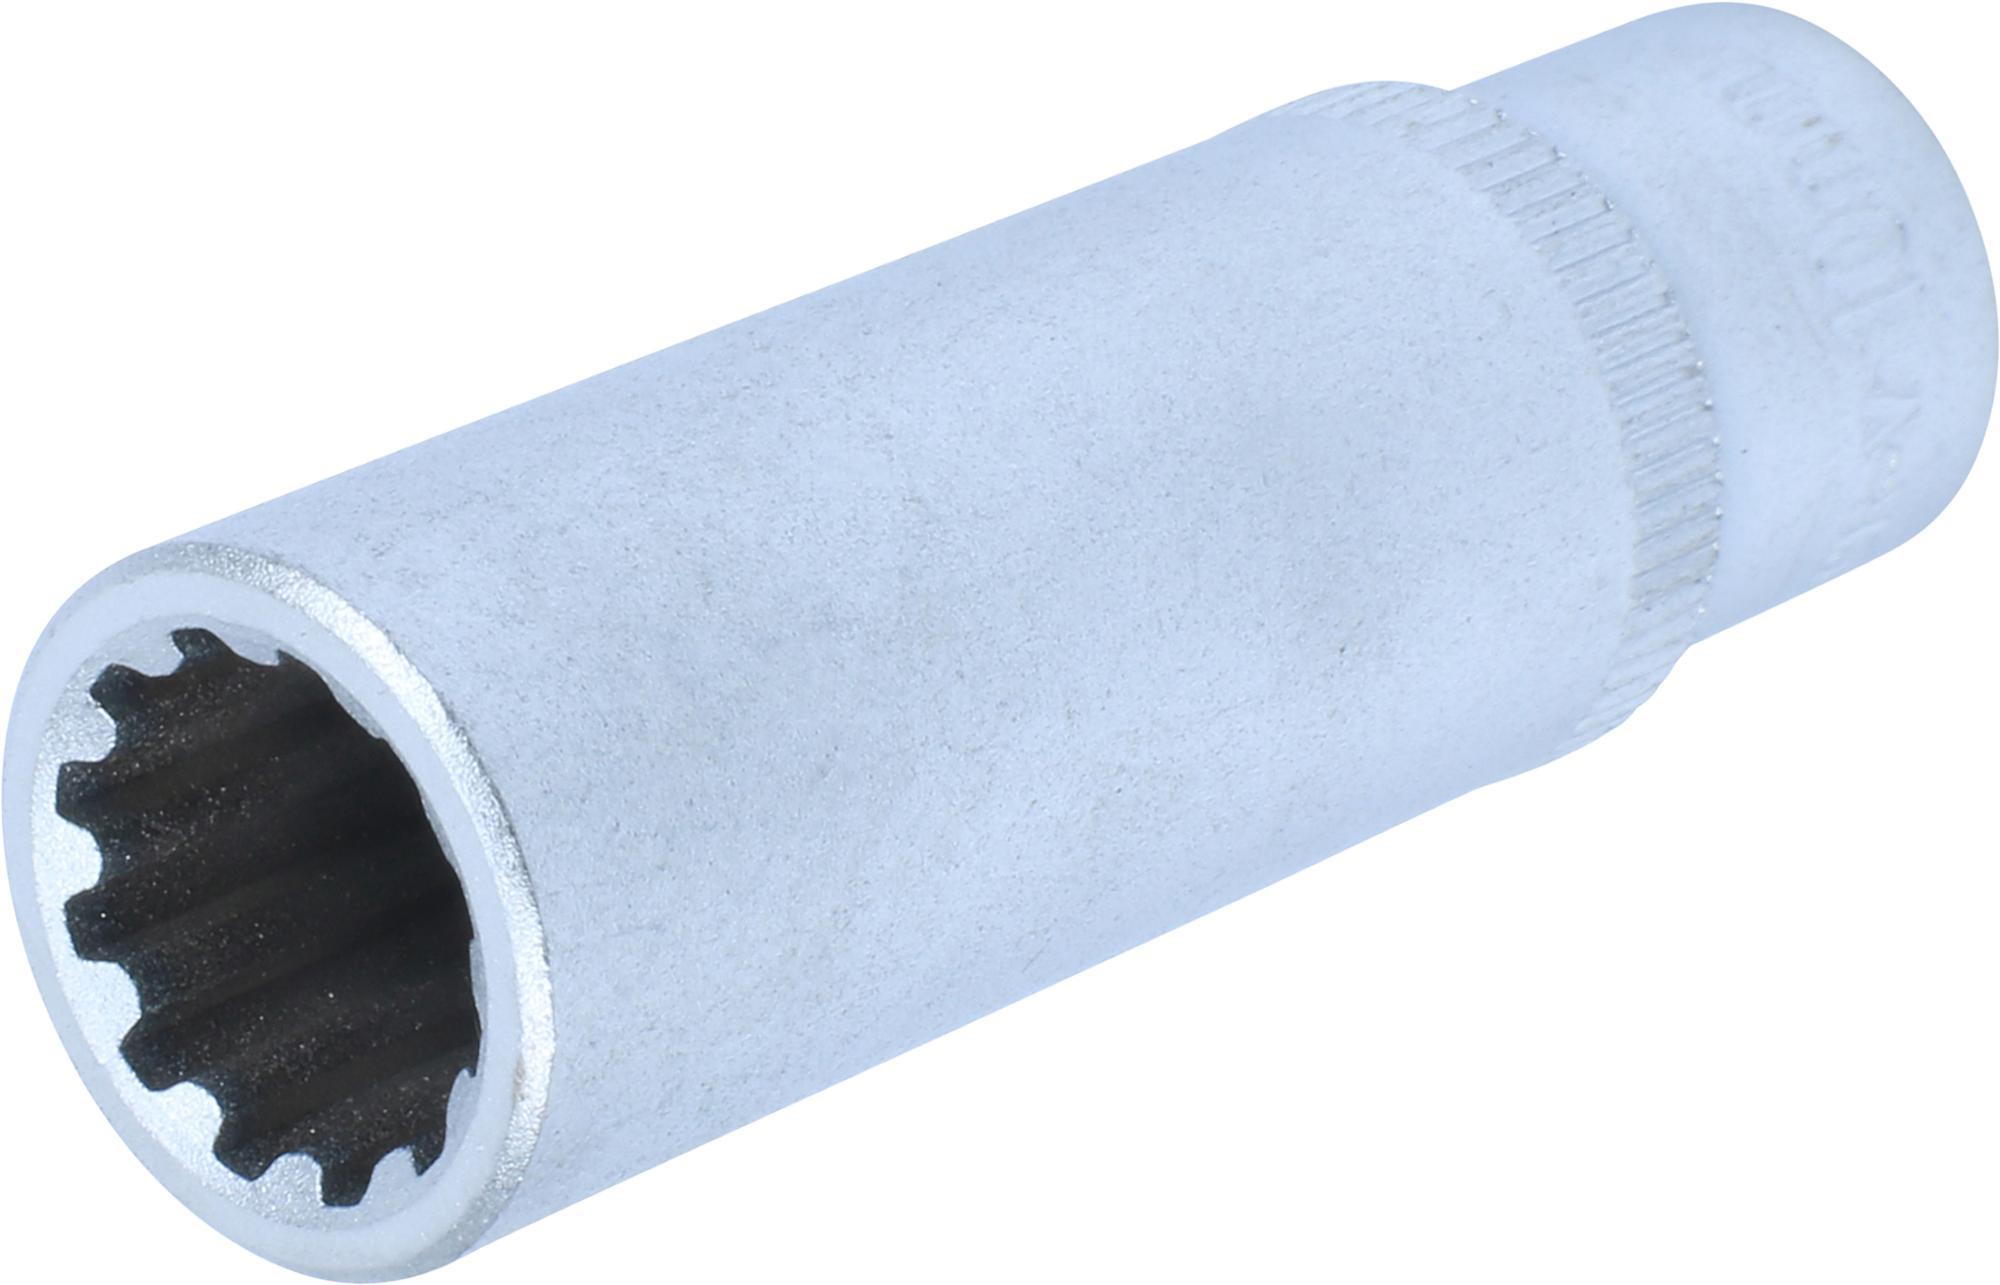 "Nástavec, 1/4"", Varioplus 10 mm, dlhý"